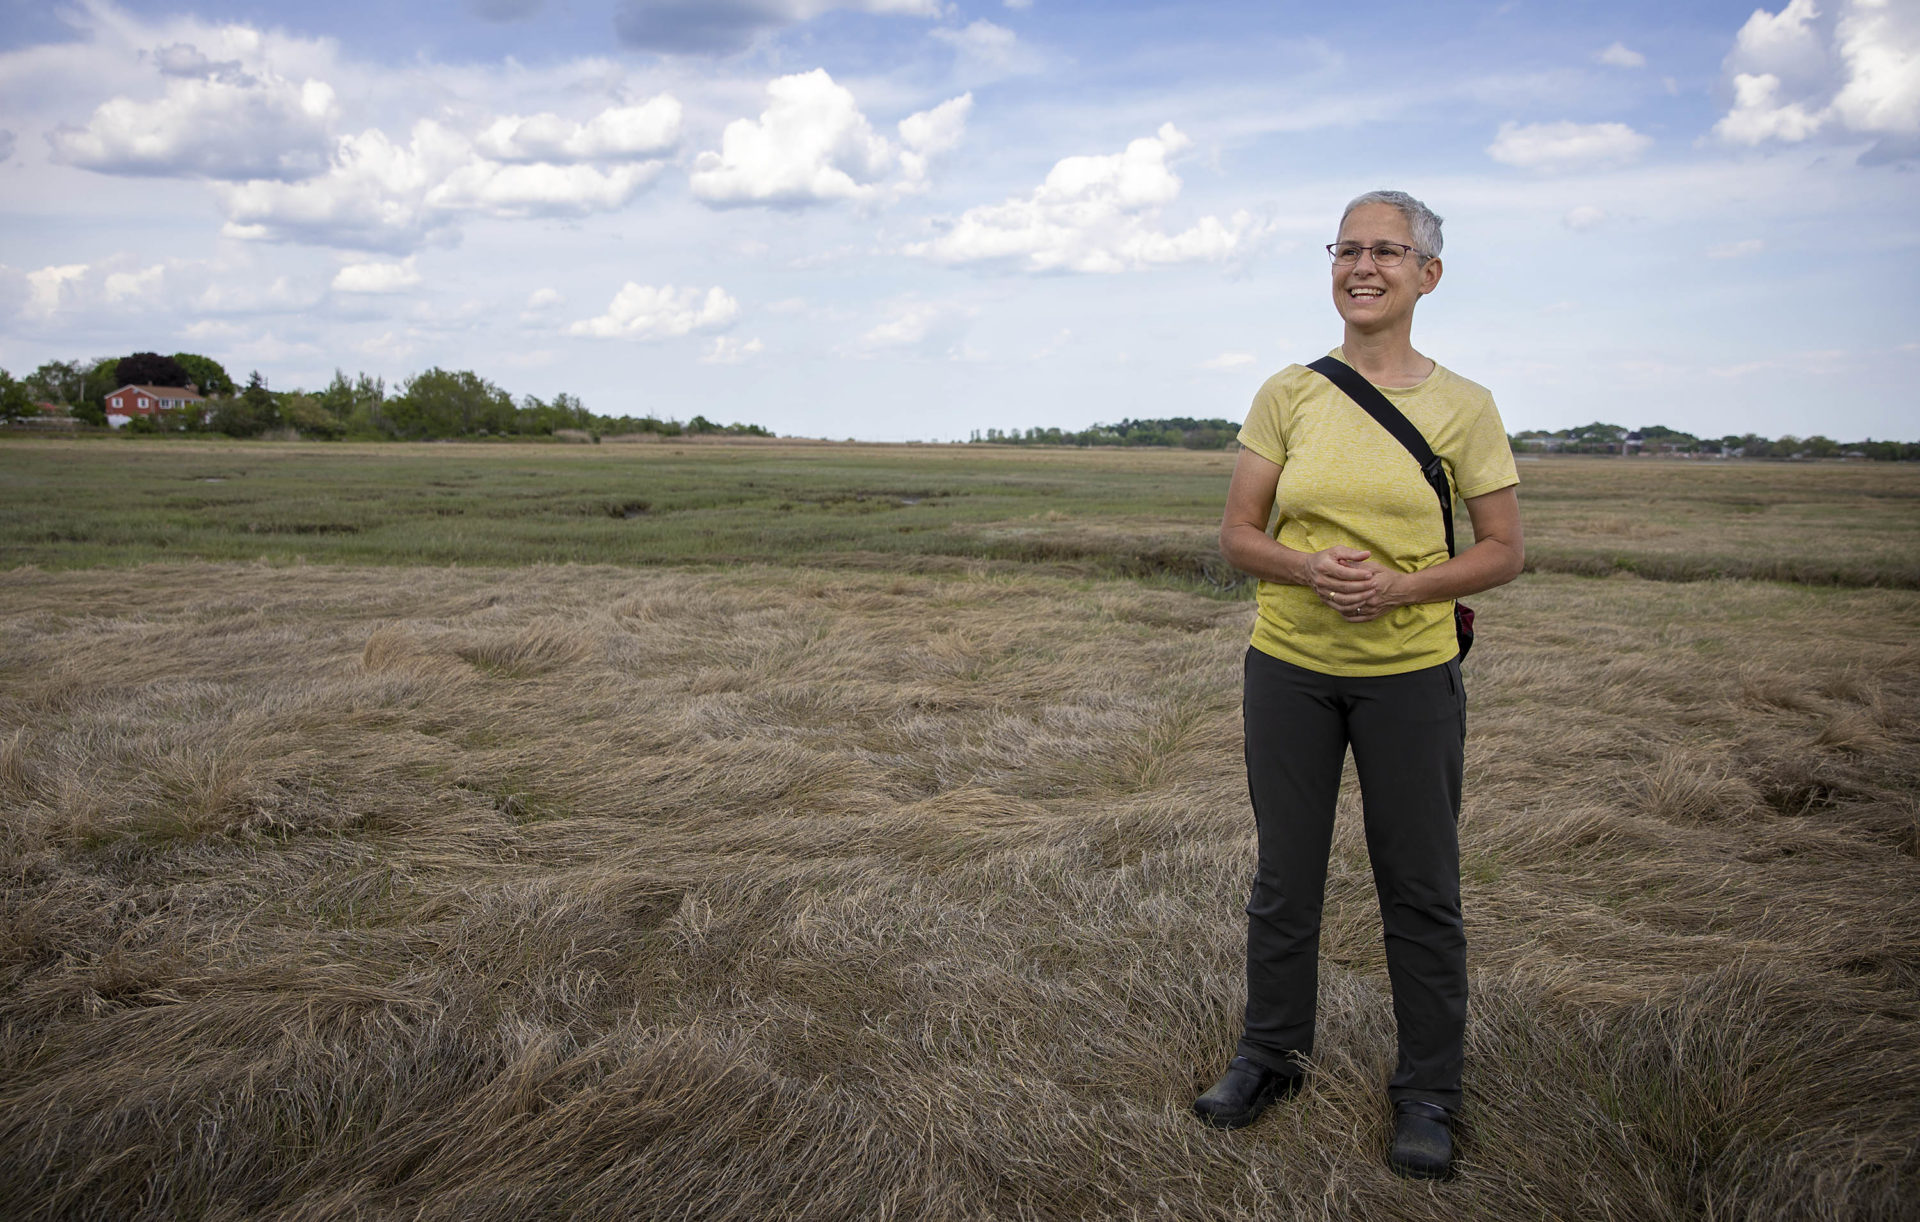 Julie Wormser, subdirectora de Mystic River Watershed Association, en Belle Isle Marsh.  (Robin Lubbock / WBUR)